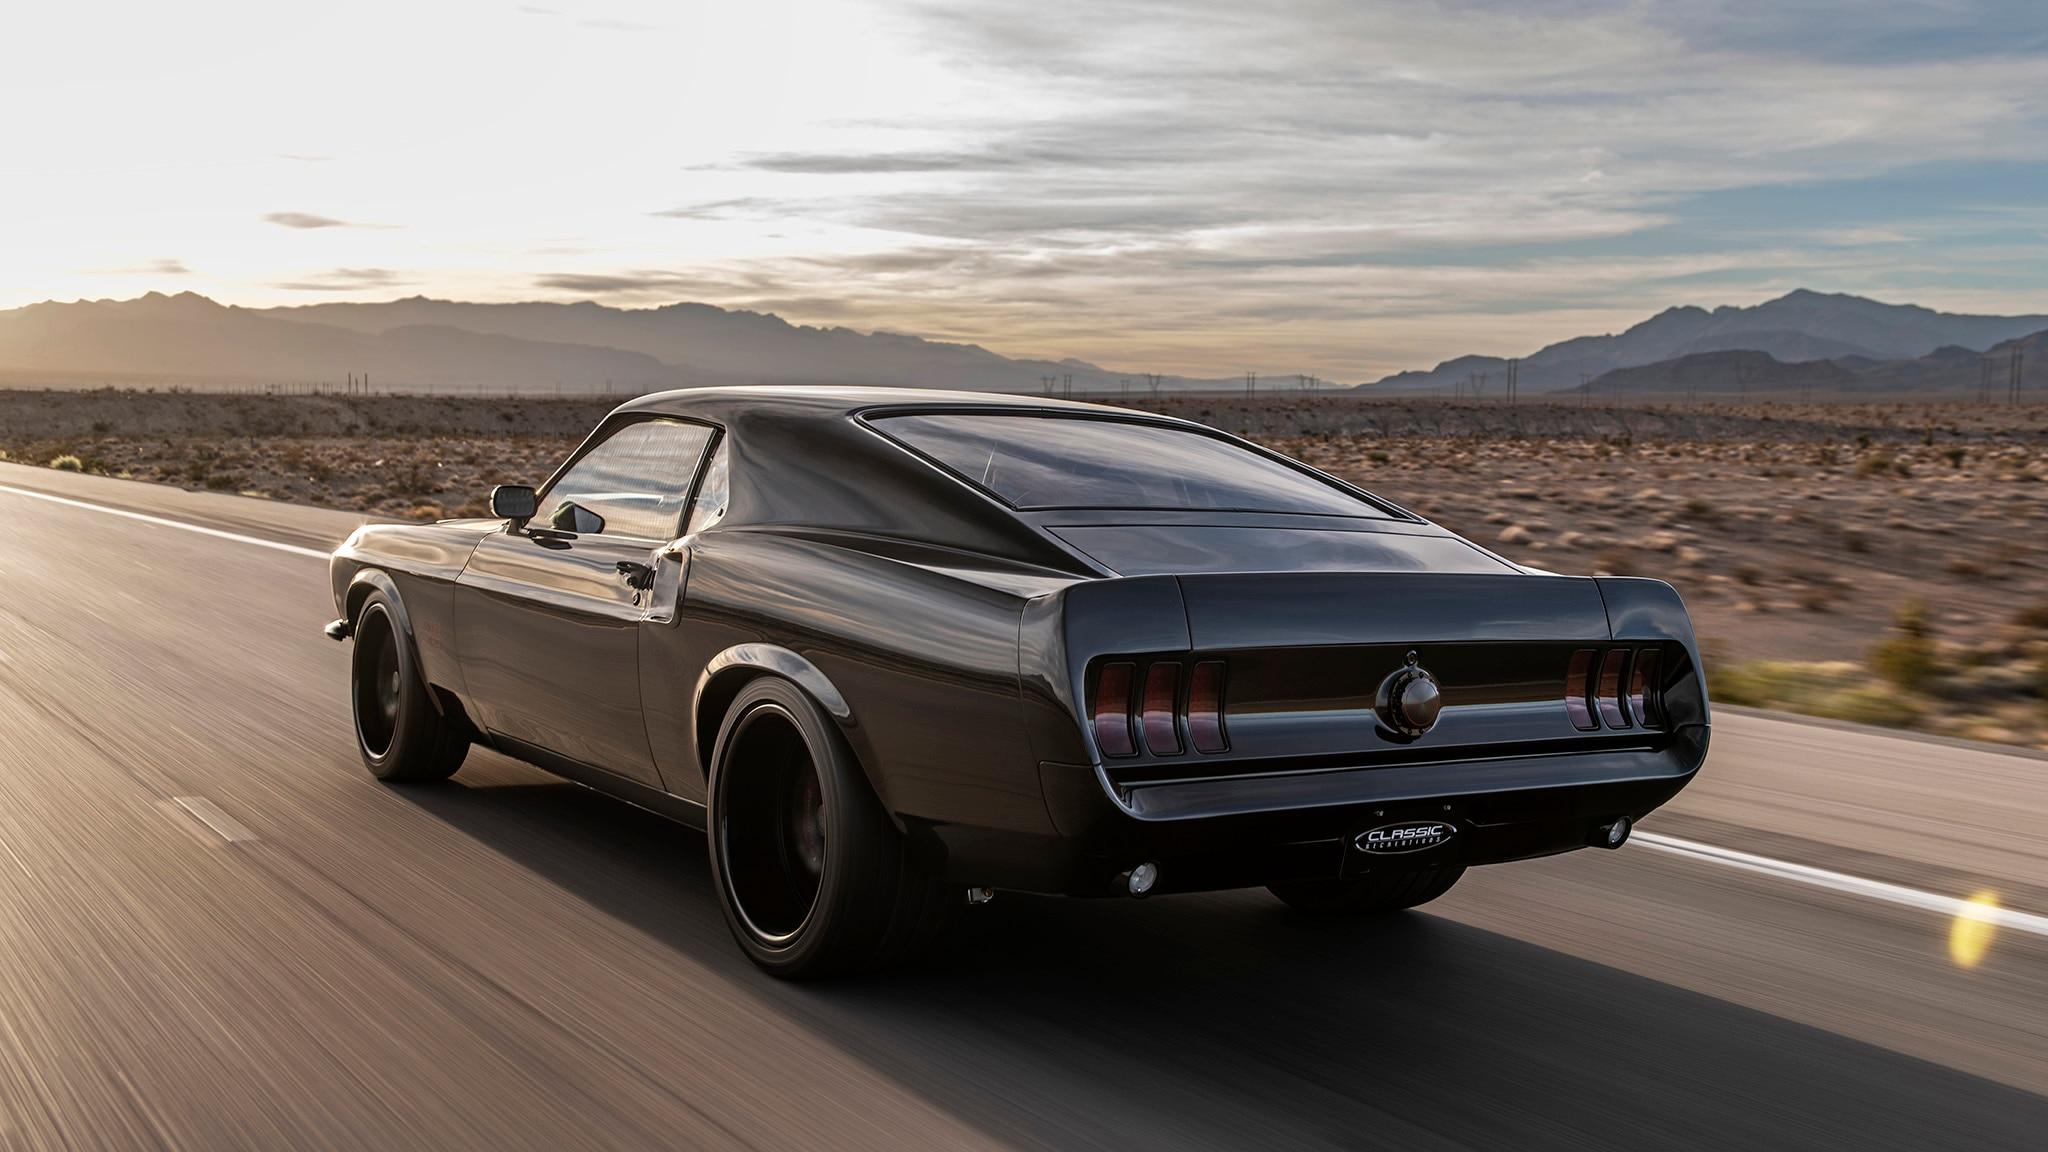 02 Classic Recreations 1969 Boss 429 Mustang